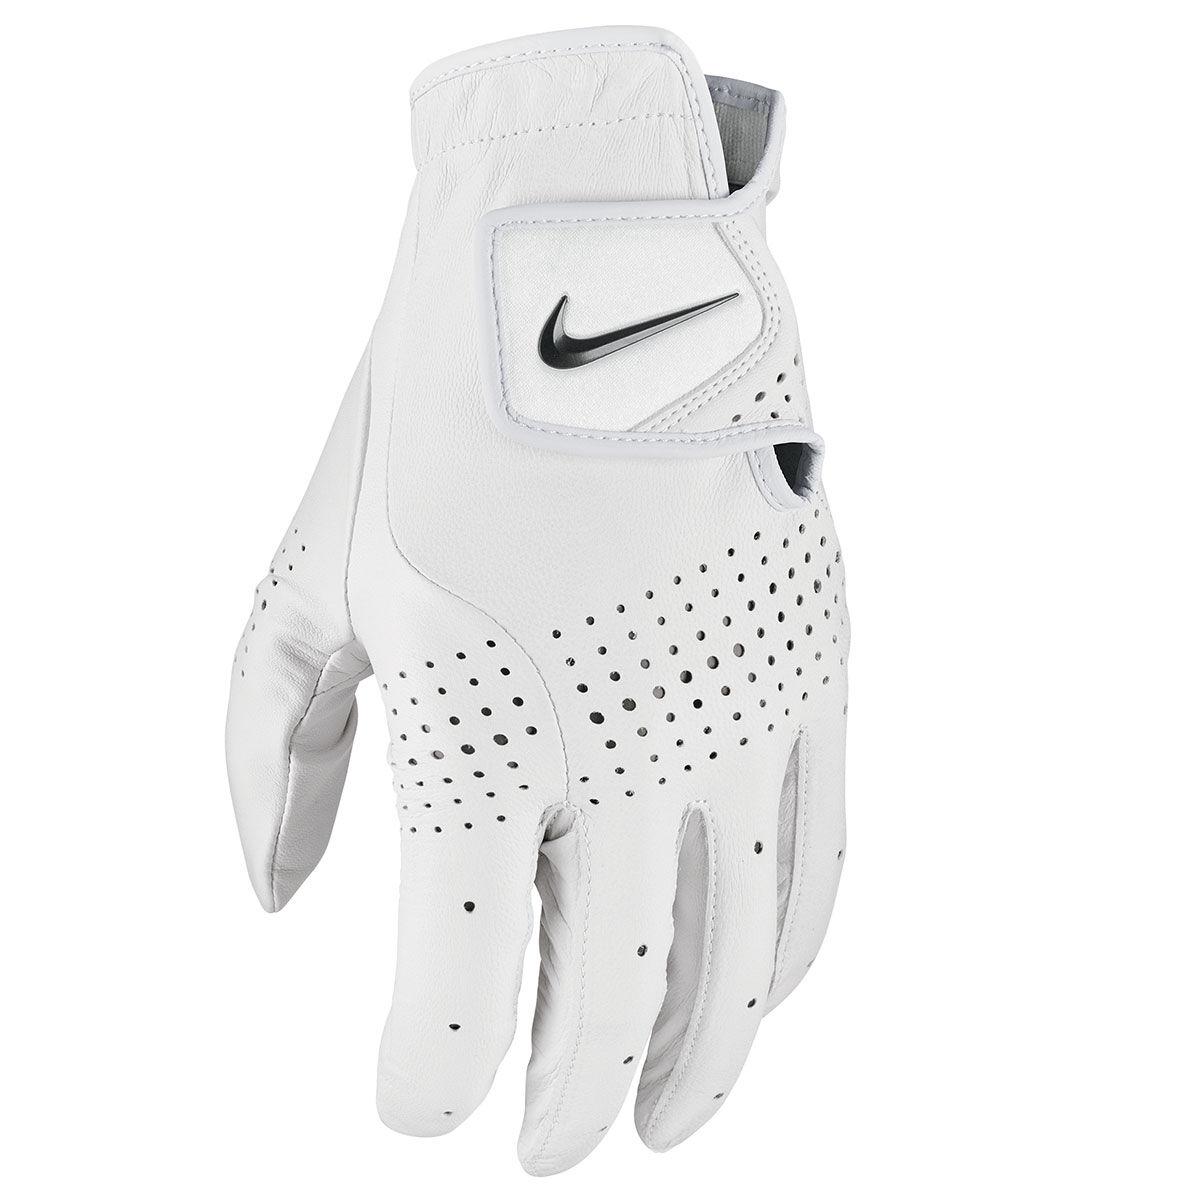 Nike Golf Tour Classic III Golf Glove, Mens, Left hand, Medium/large, Pearl white/black   American Golf